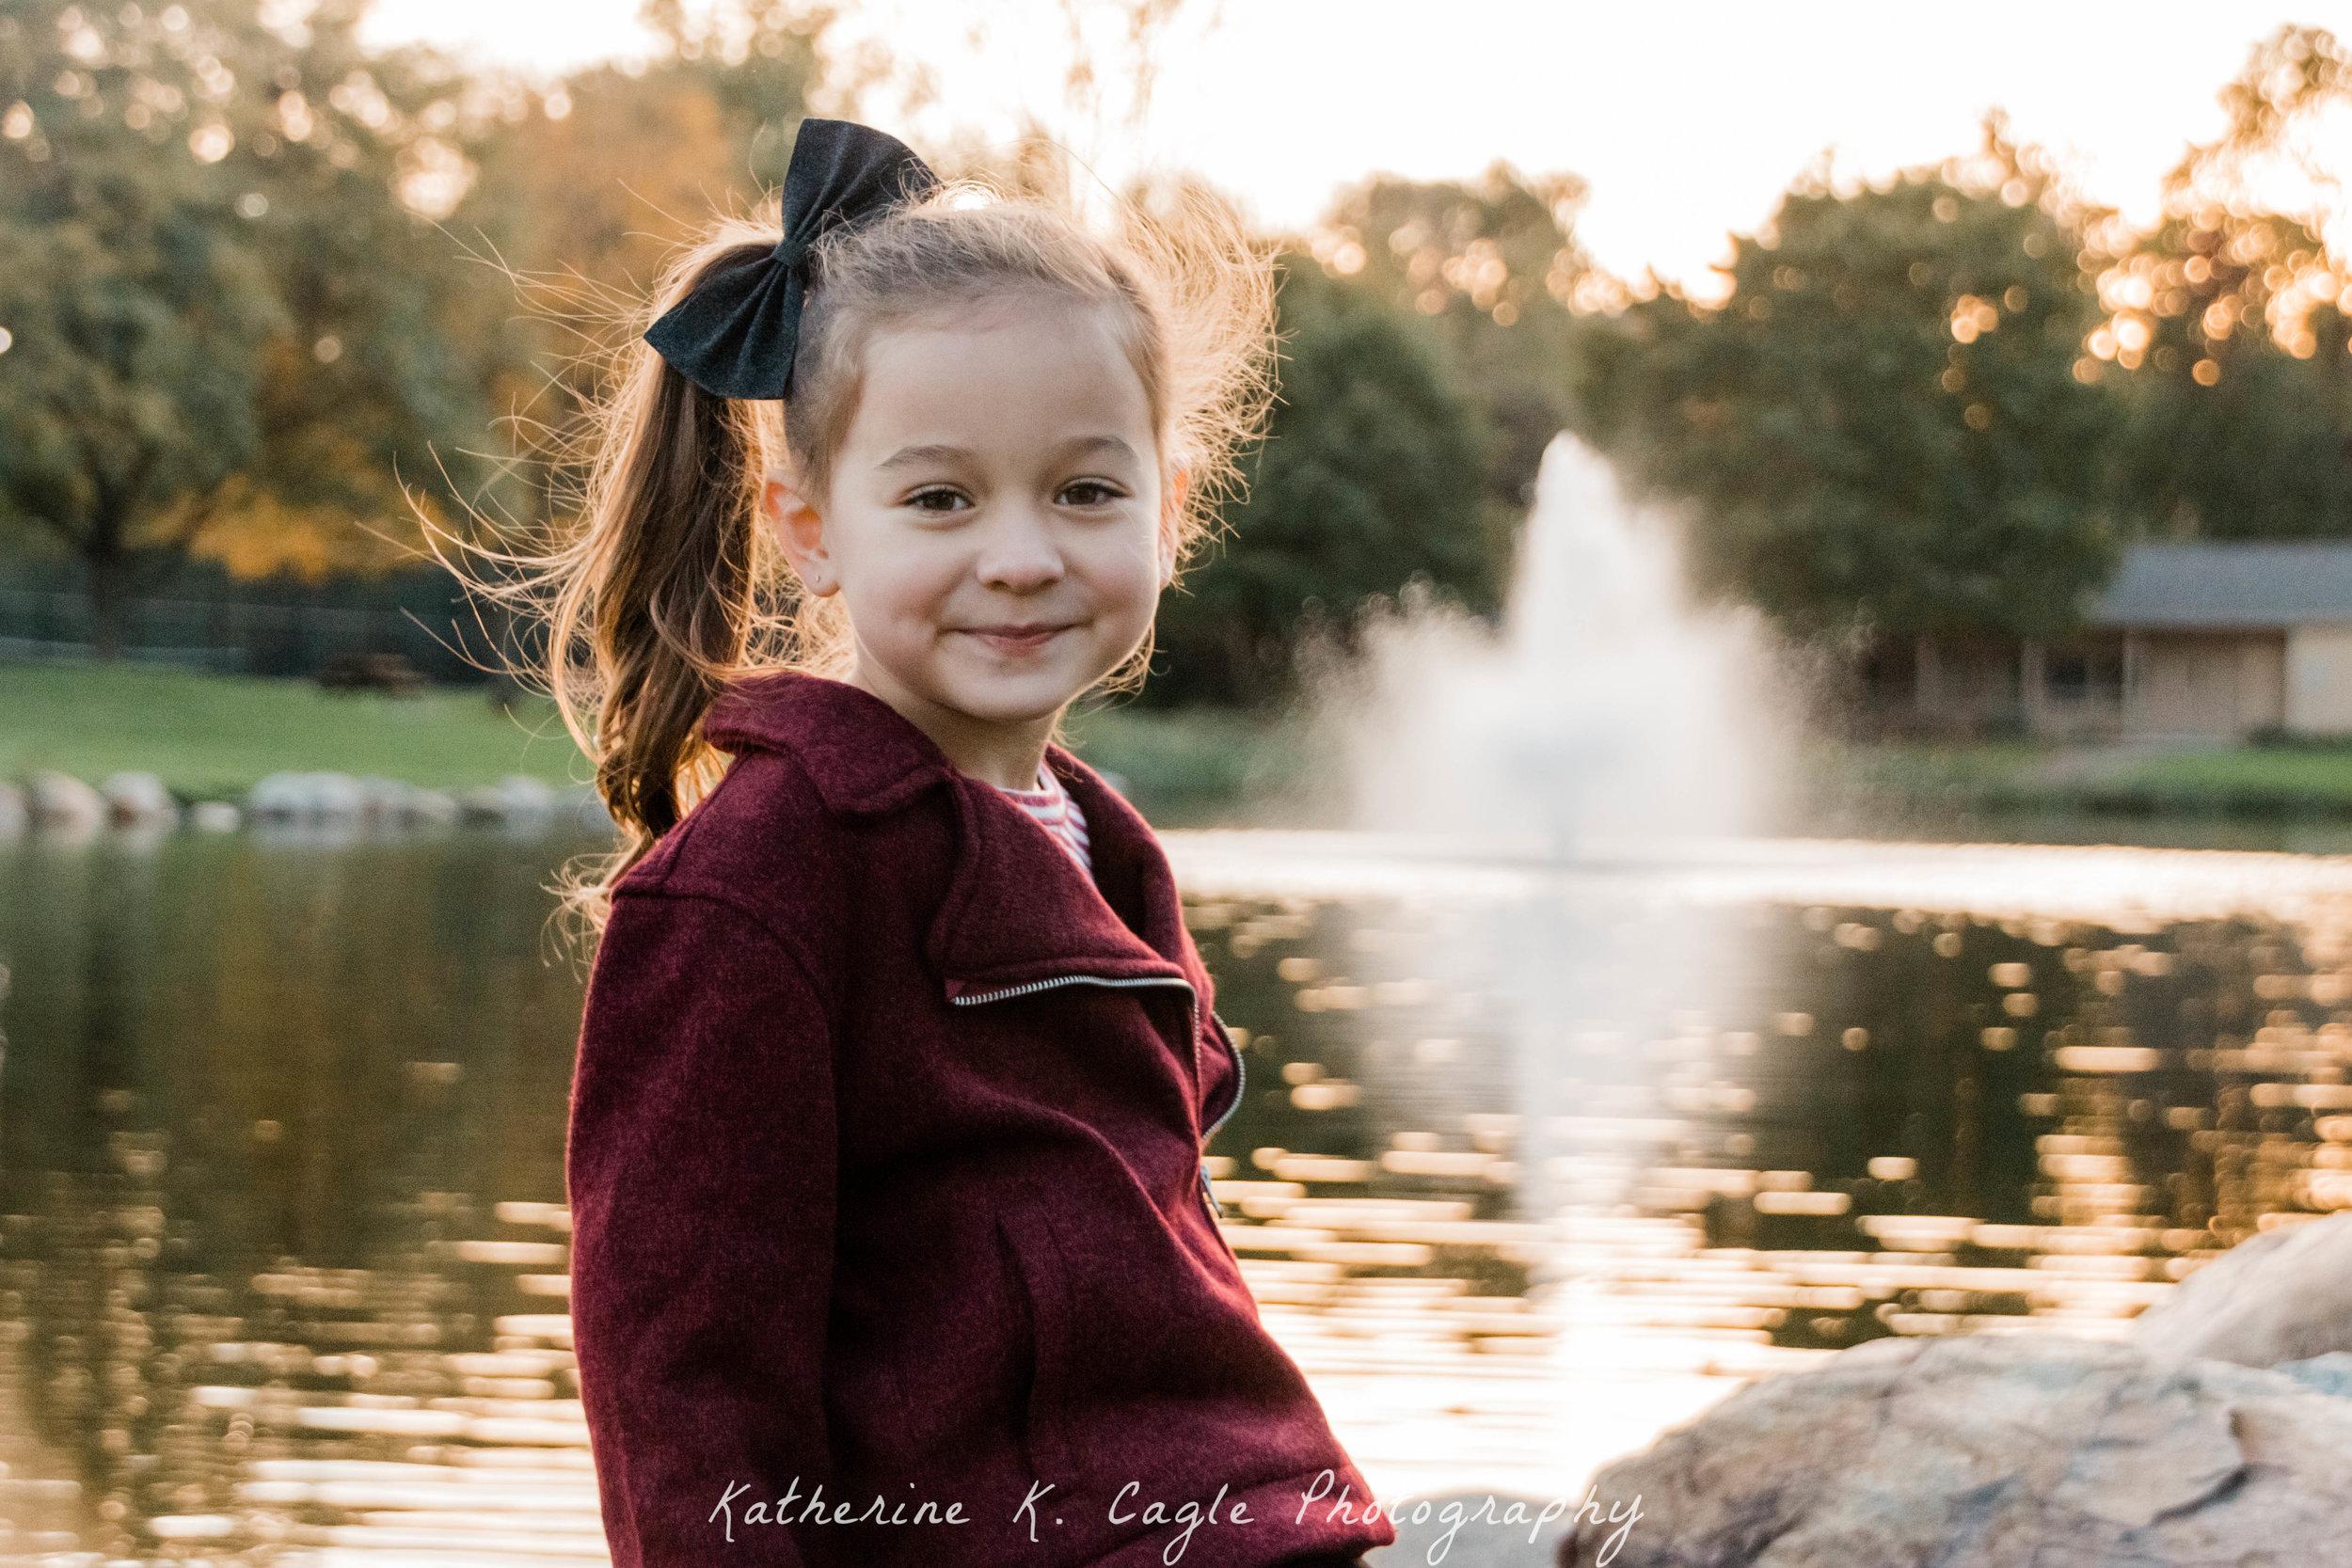 KatherineKCagle_Capogrossa-69.jpg